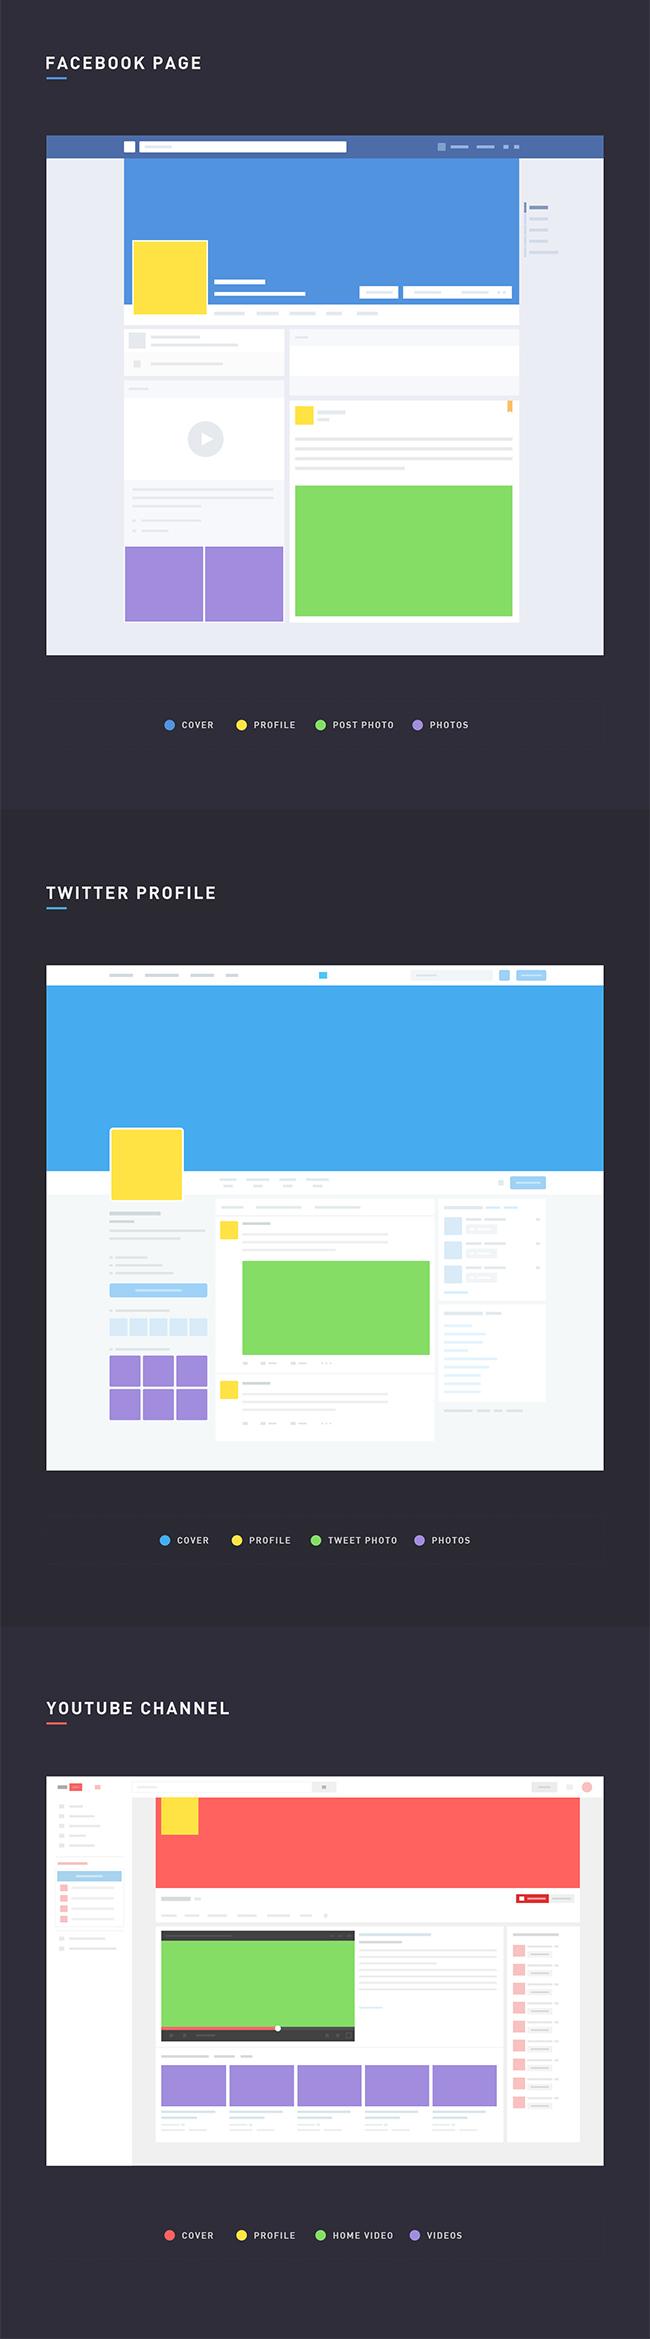 Wunderbar Social Media Profilvorlage Galerie - Beispiel ...